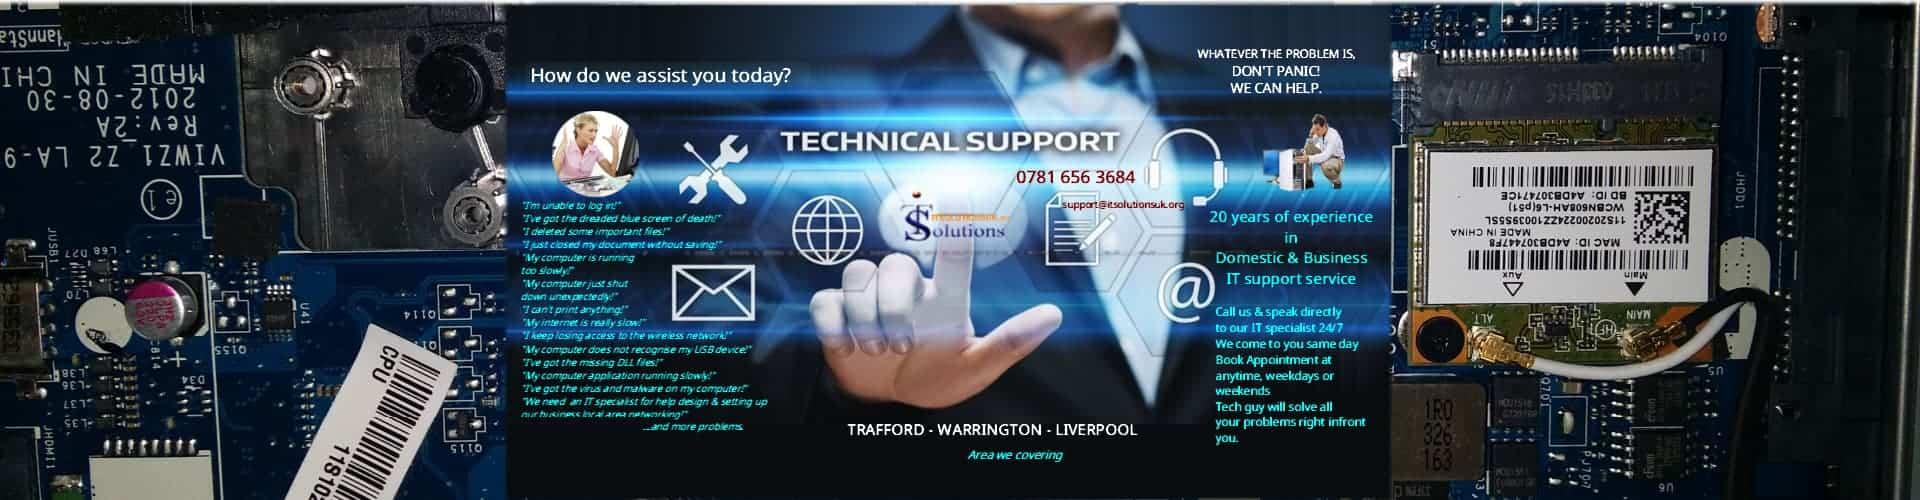 computer_network_experts_repair_warrington